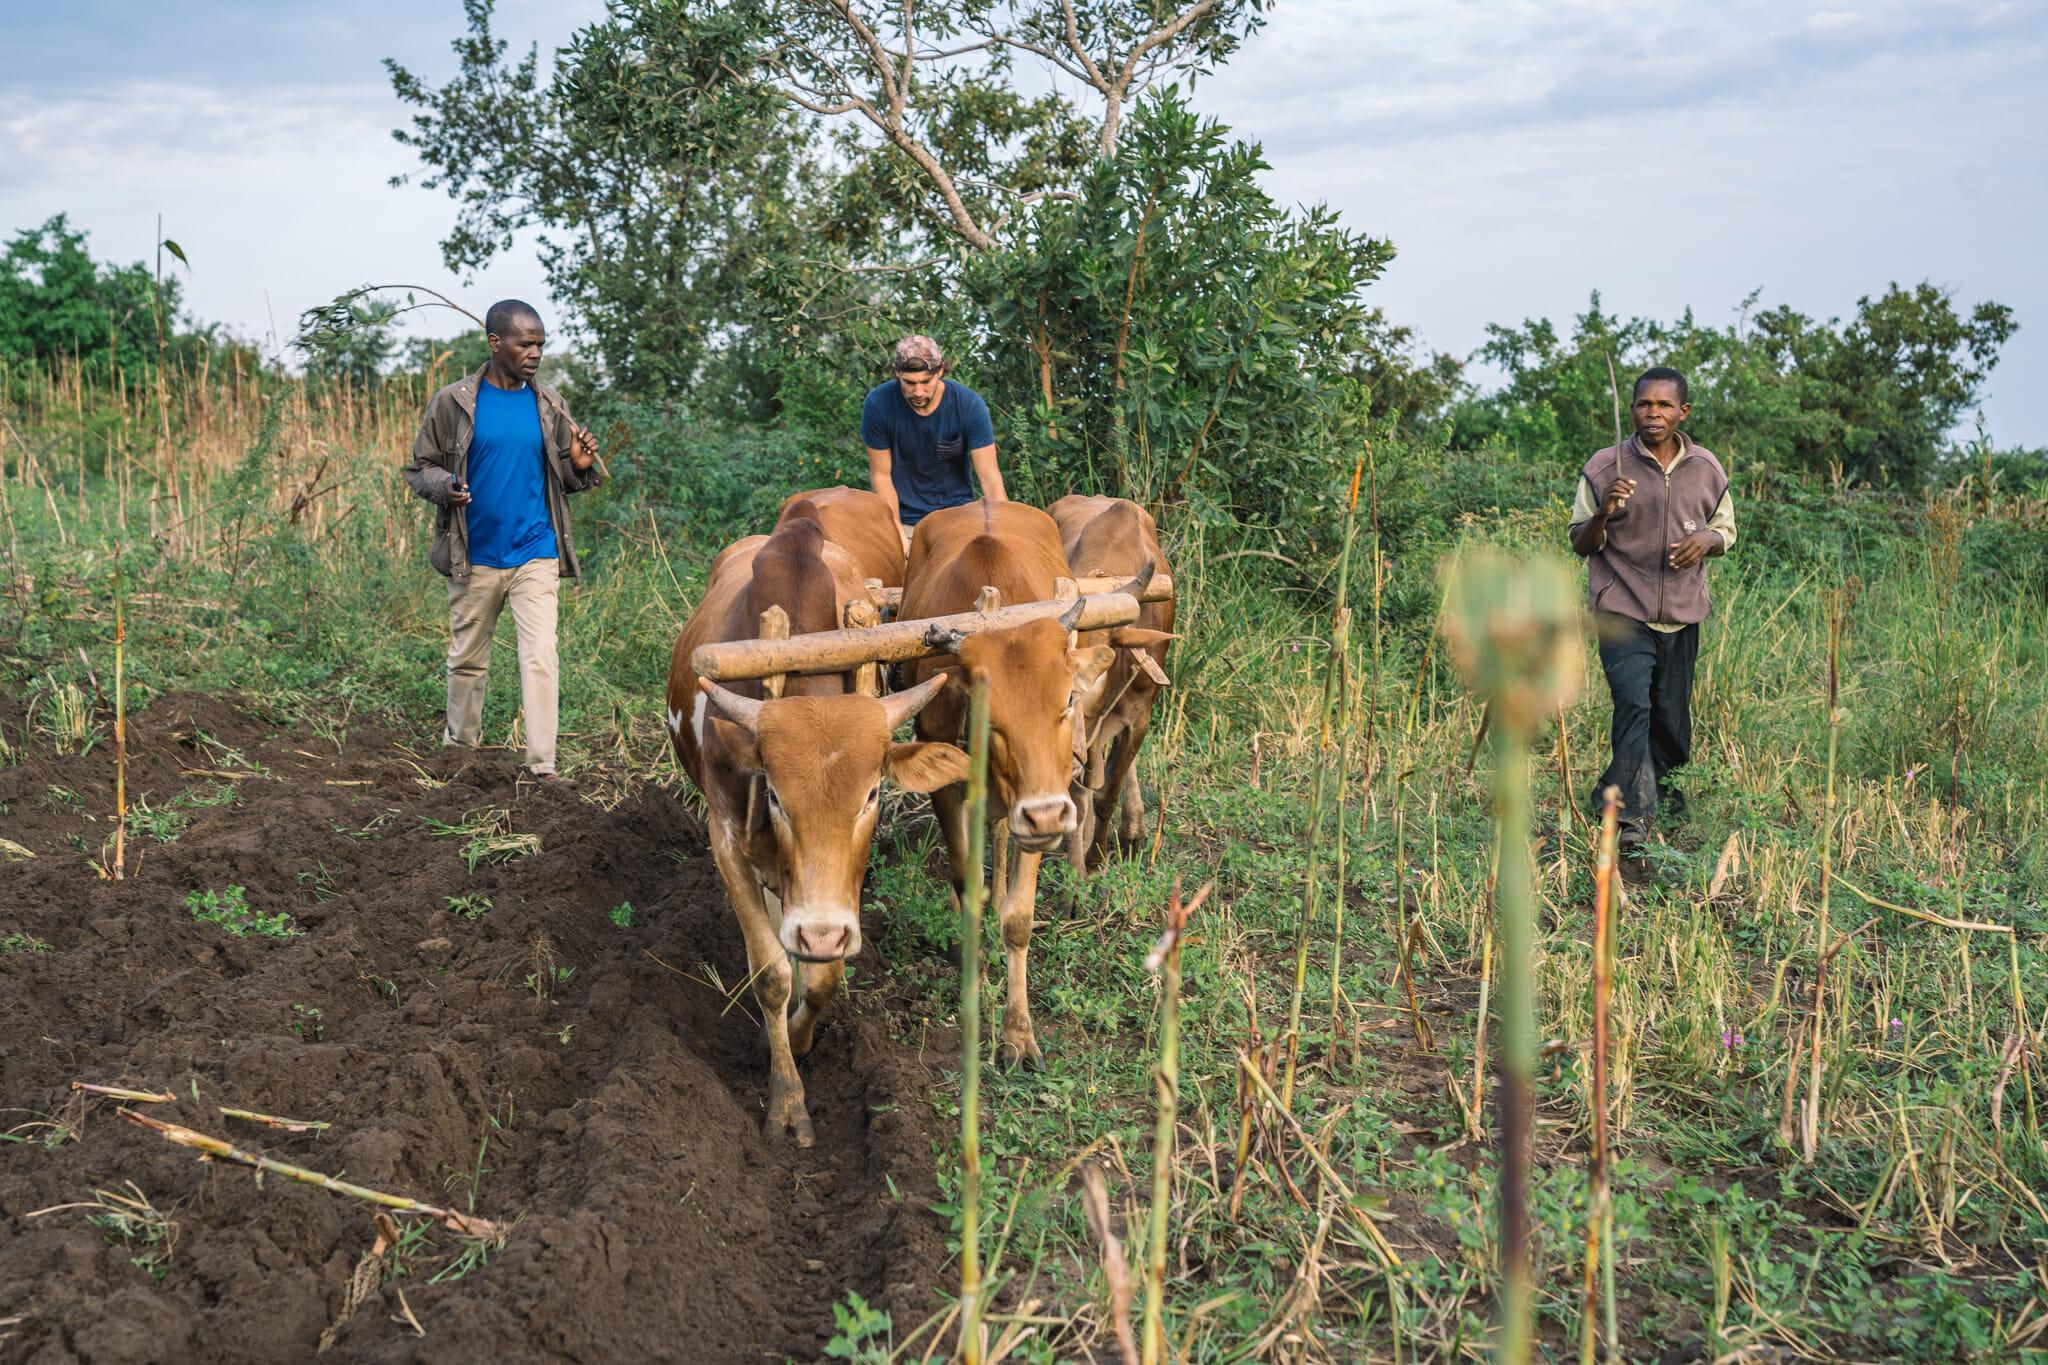 Jules en plein labourage dans les champs du village de Nyamburi en tanzanie